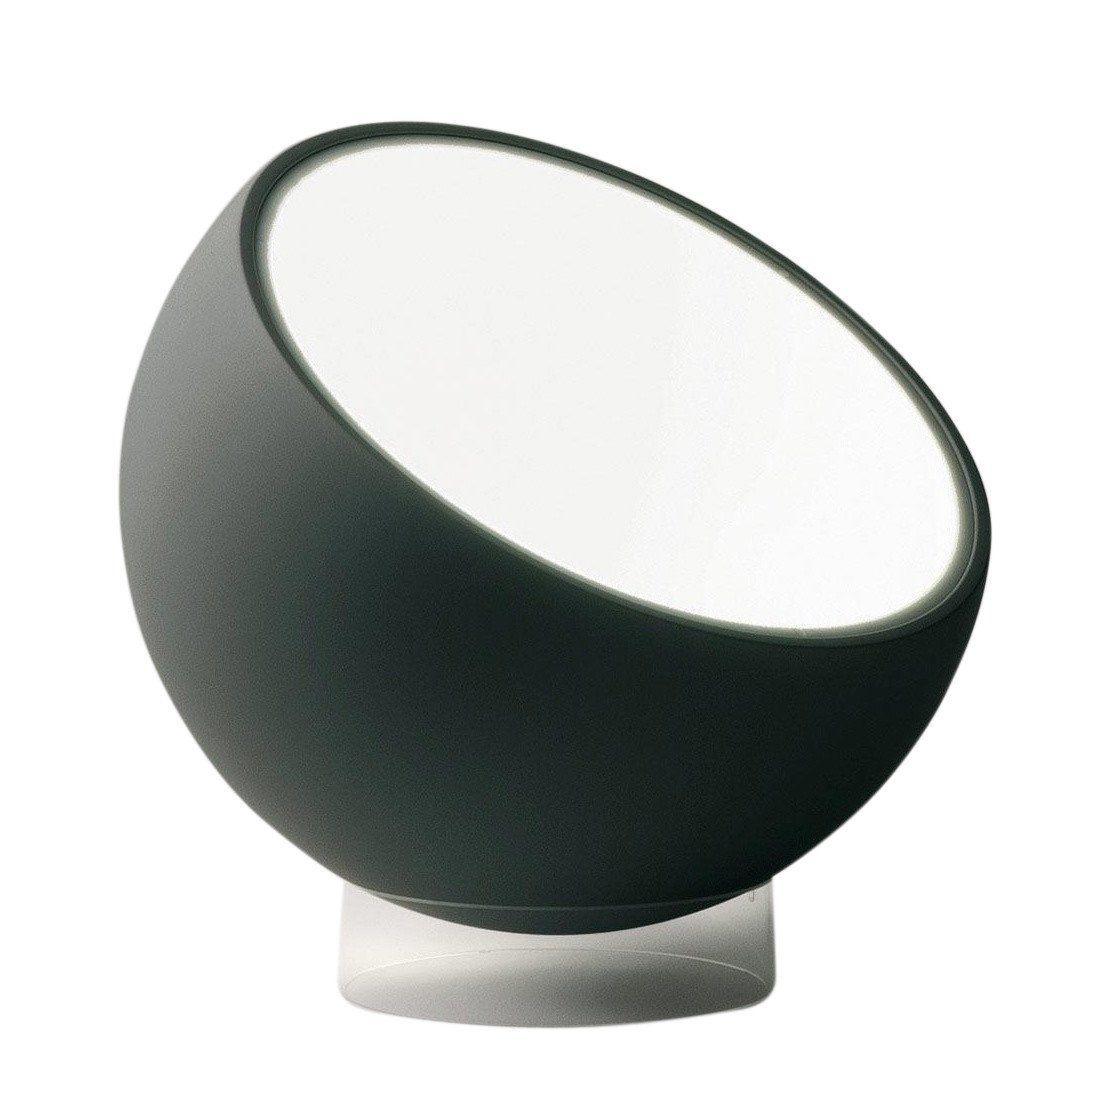 prandina biluna f7 eco lampe de sol ambientedirect. Black Bedroom Furniture Sets. Home Design Ideas